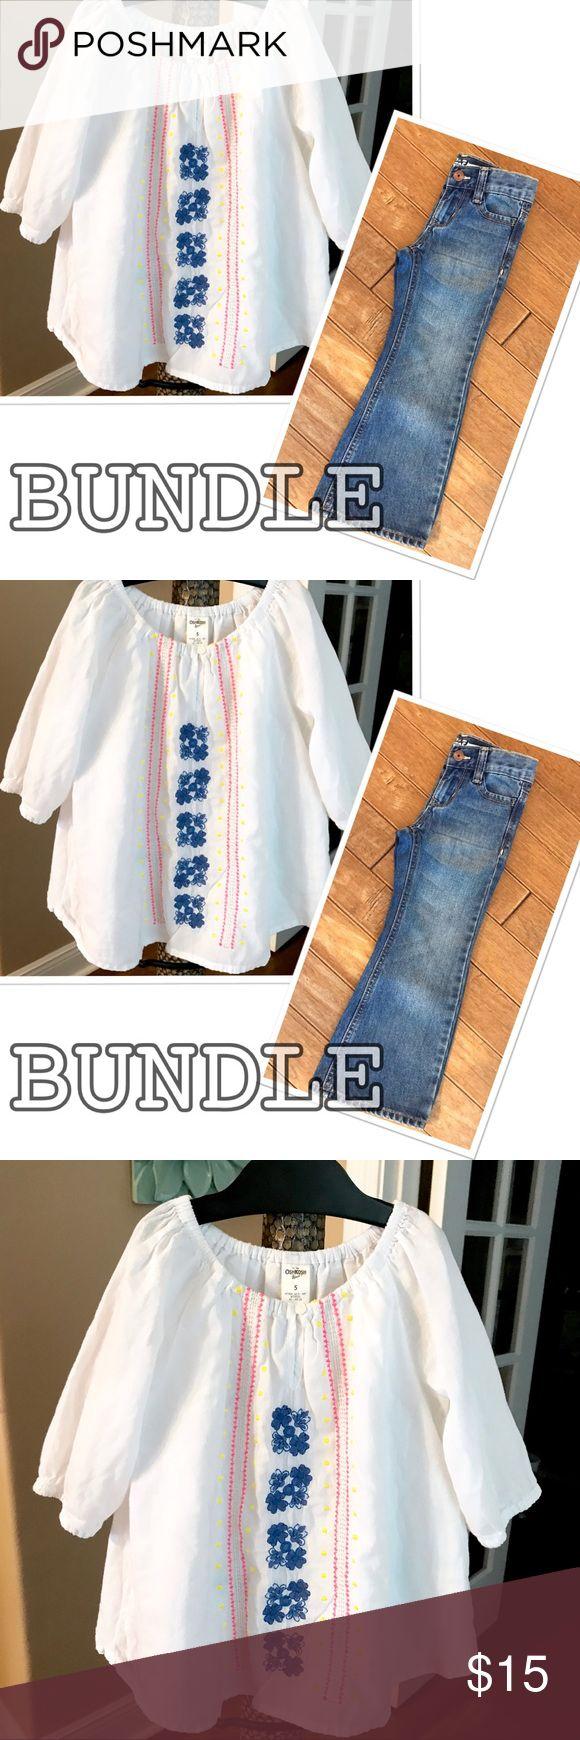 OSHKOSH Bundle Blouse & Bootcut Jeans 4/5 White peasant blouse & bootcut jeans. Excellent Condition! 🚭 OshKosh B'gosh Matching Sets